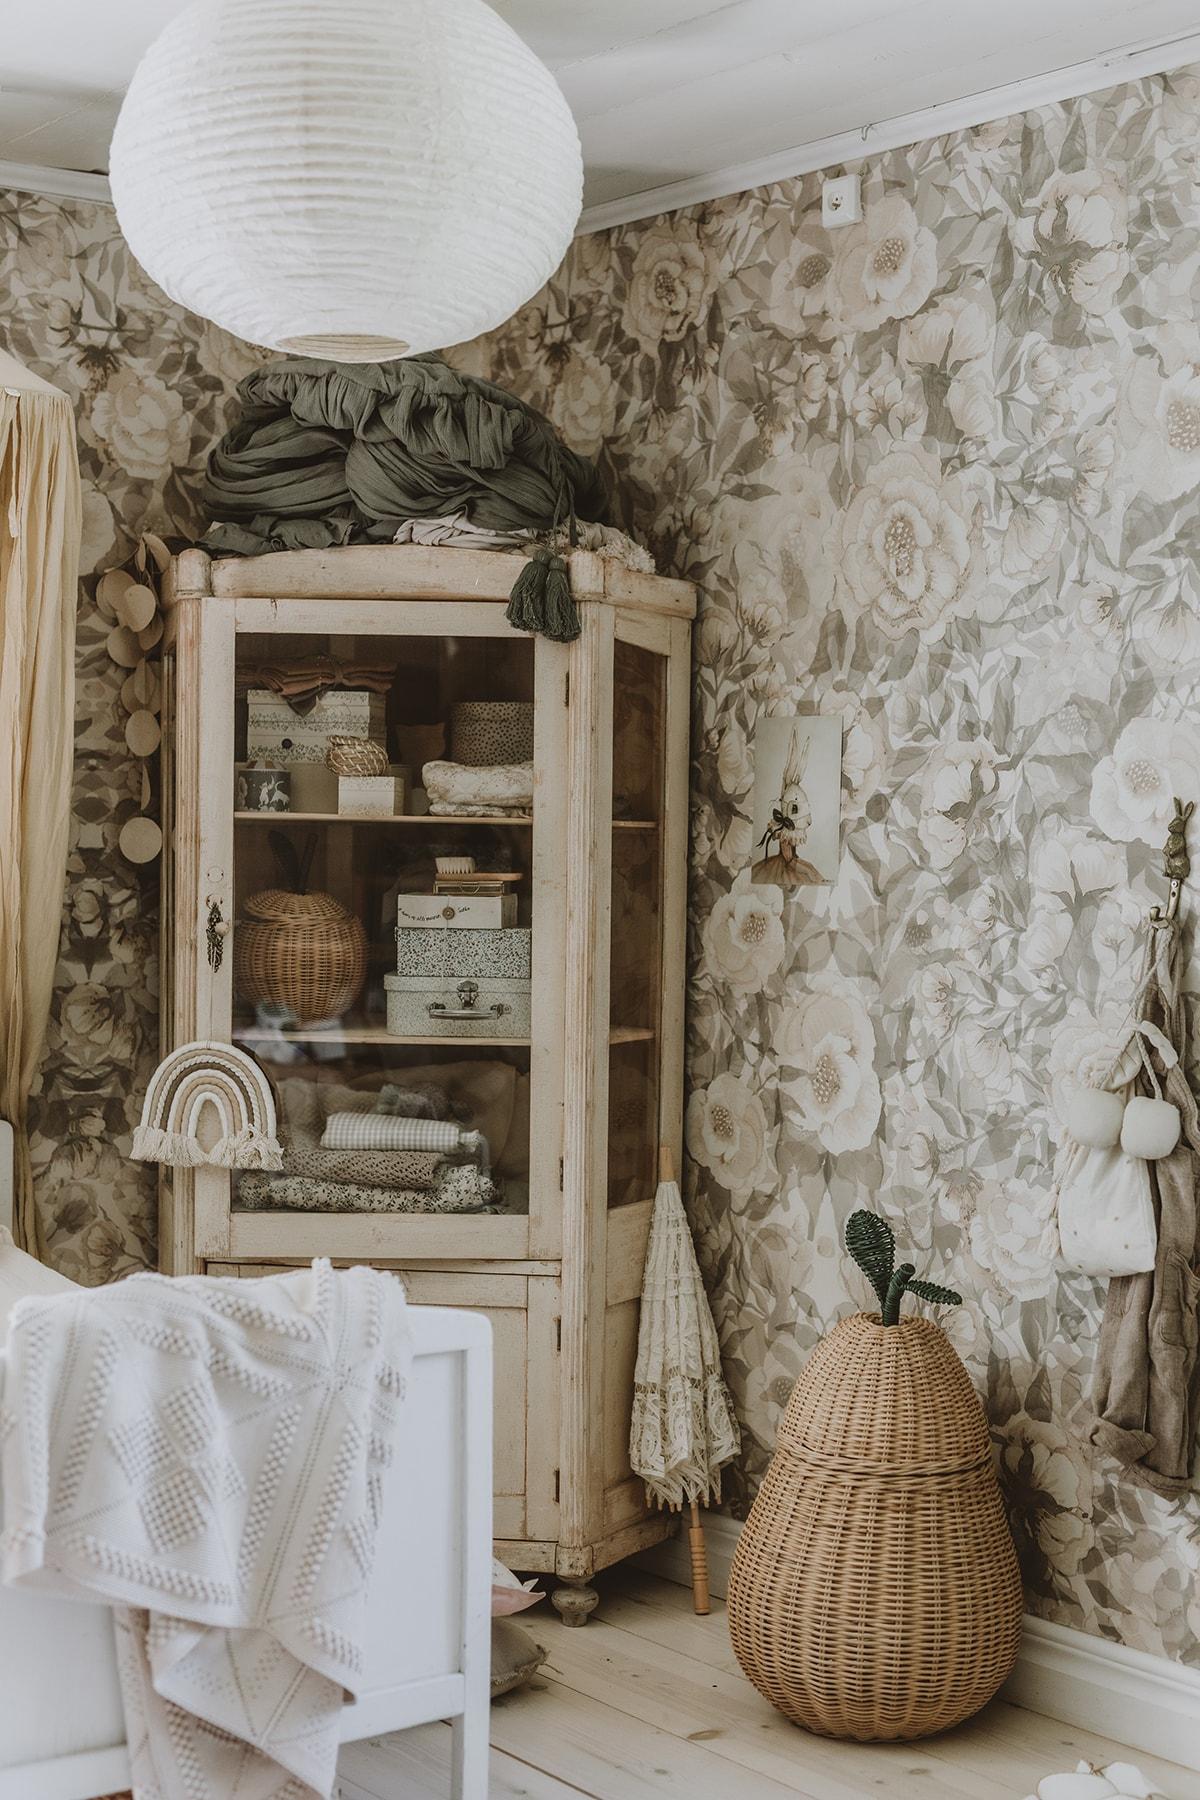 Floral_wallpaper_poppies_white_Mrs_Mighetto